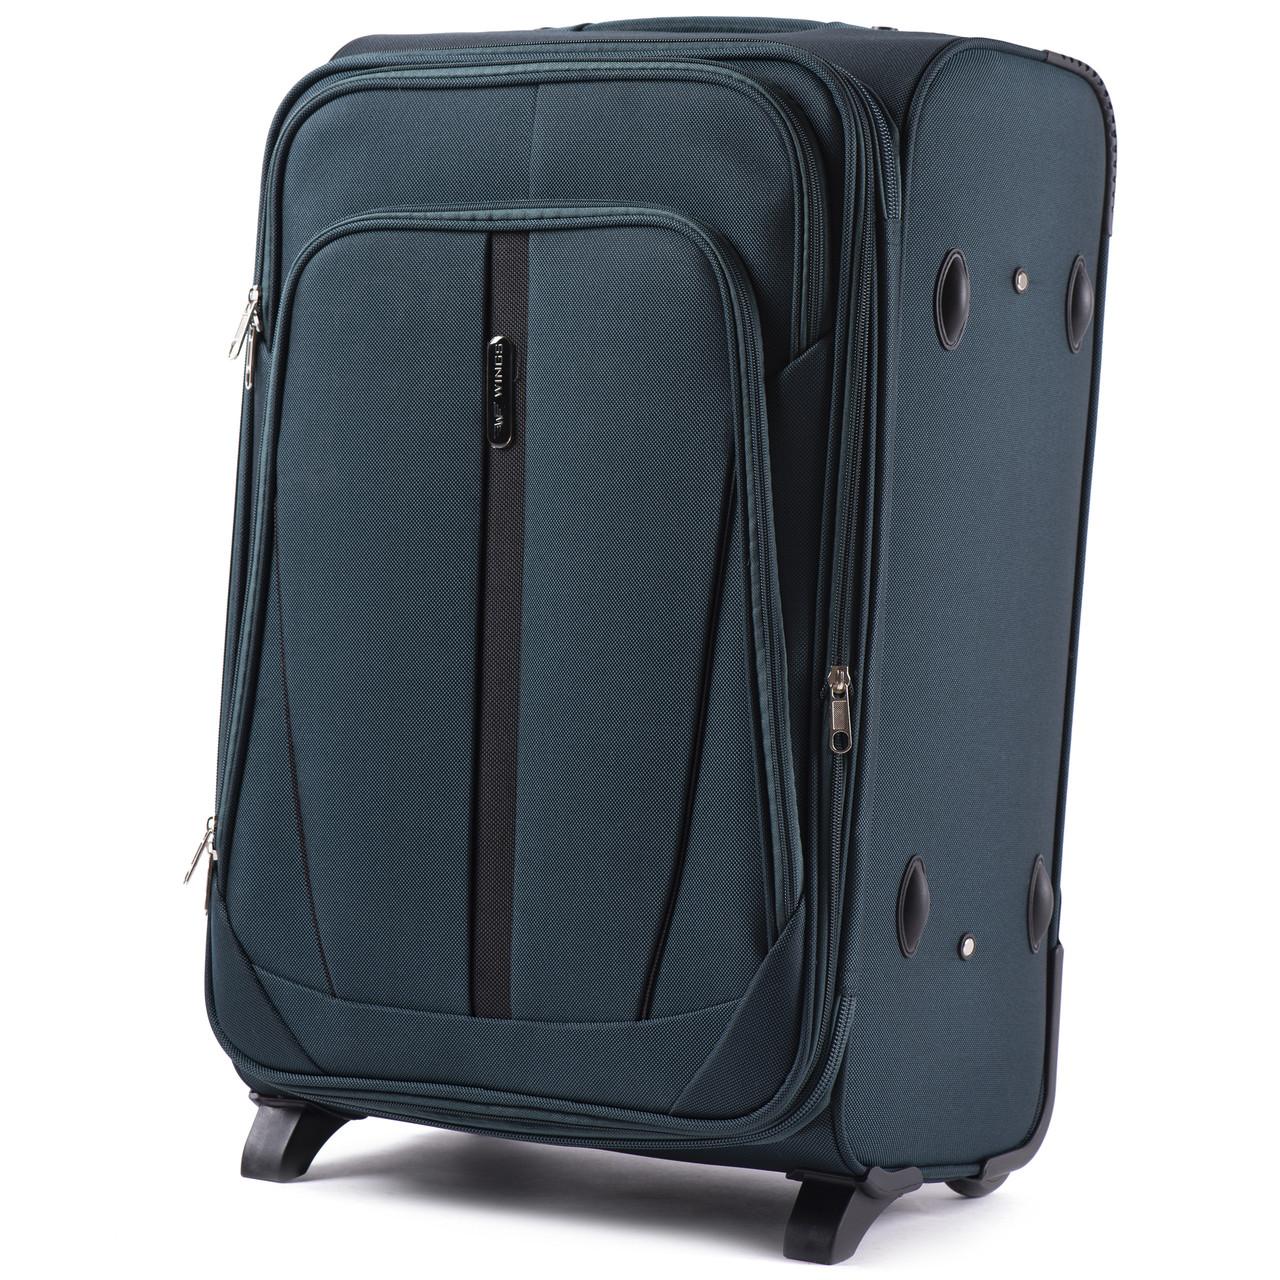 a23dab68d34c Малый тканевый чемодан Wings 1706 на 2 колесах зеленый: продажа ...